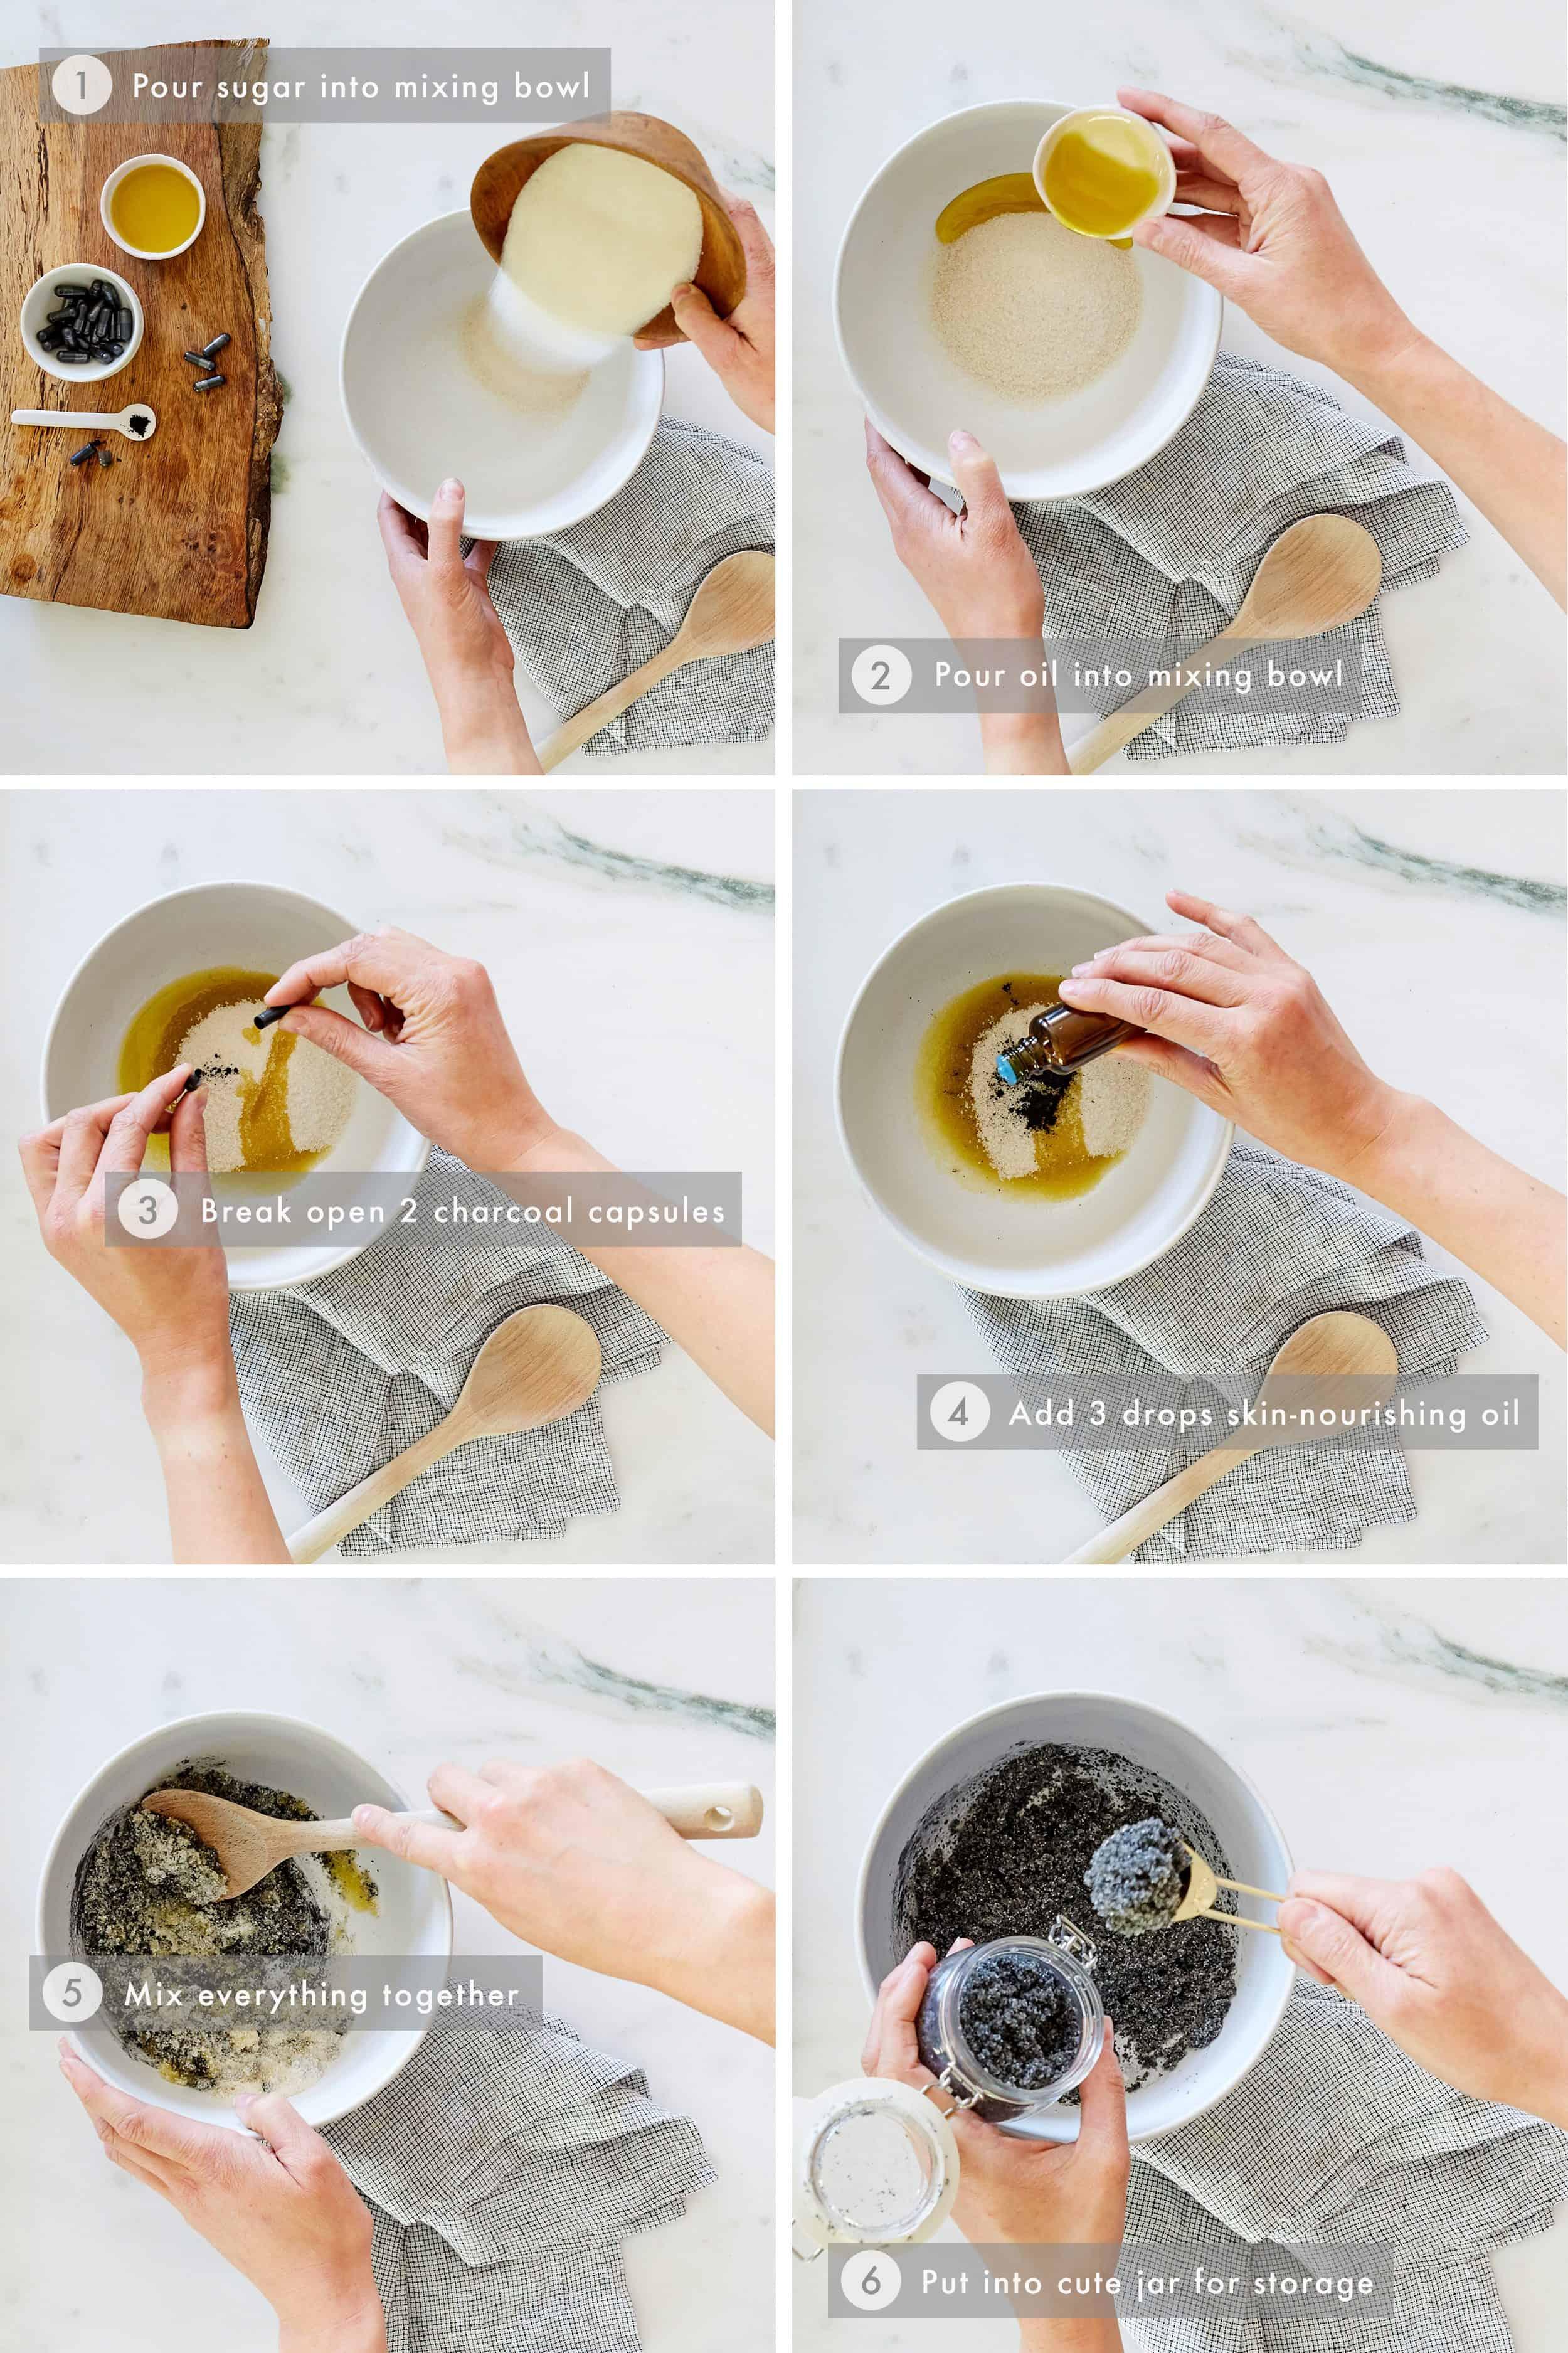 DIY Charcoal Face Scrub Step-by-Step